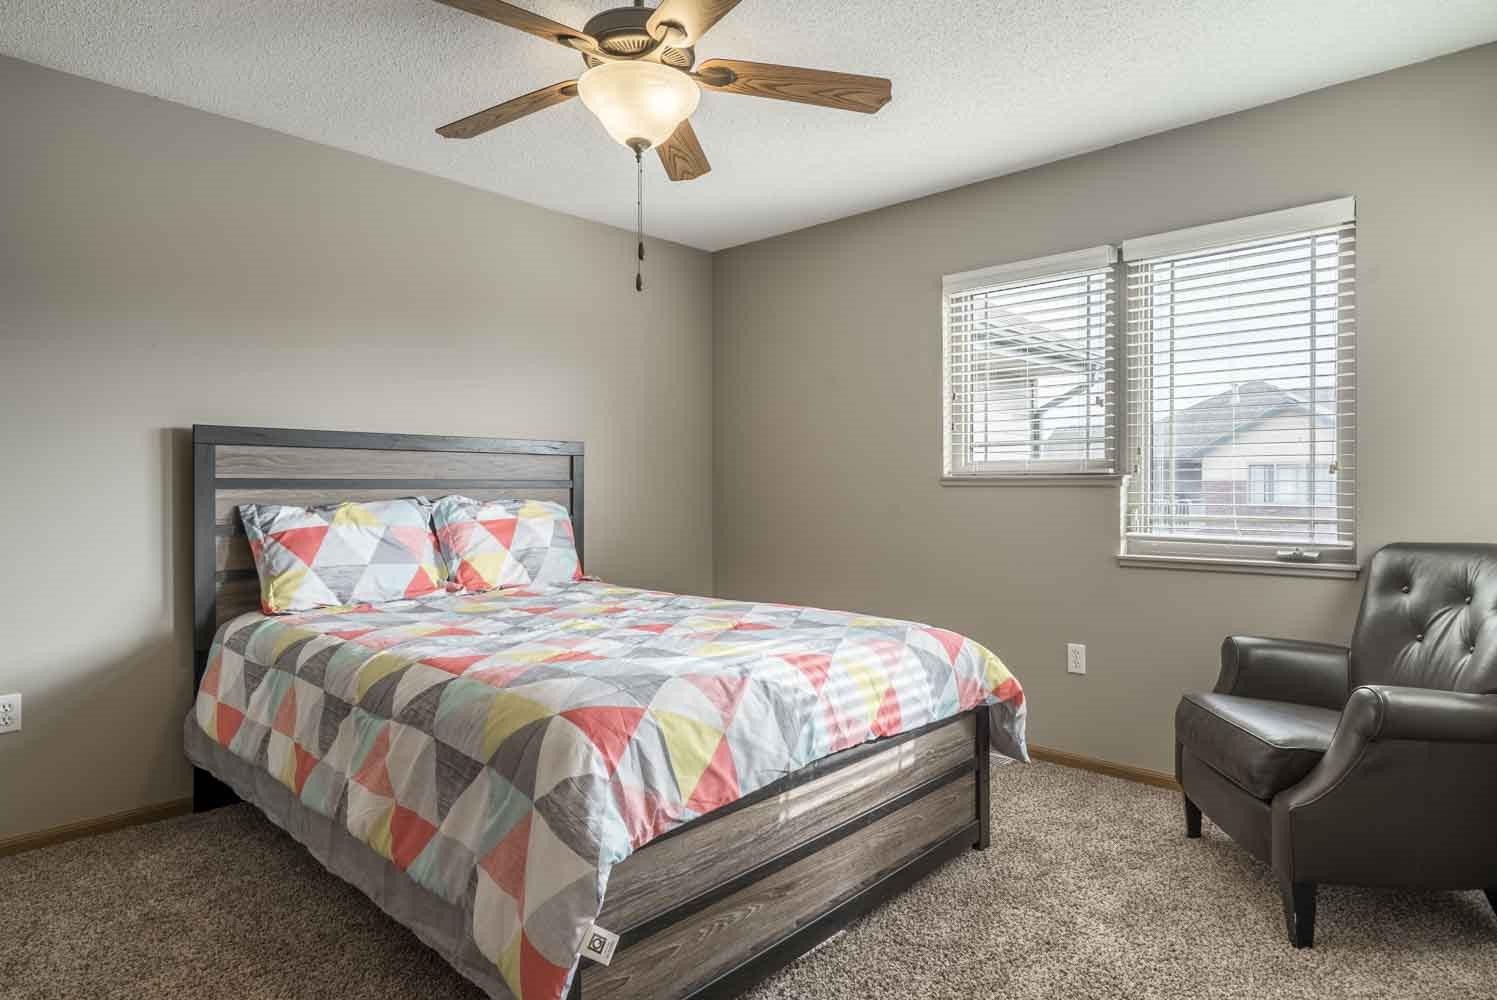 Second bedroom with ceiling fan at Southwind Villas in southwest Omaha in La Vista, NE, 68128